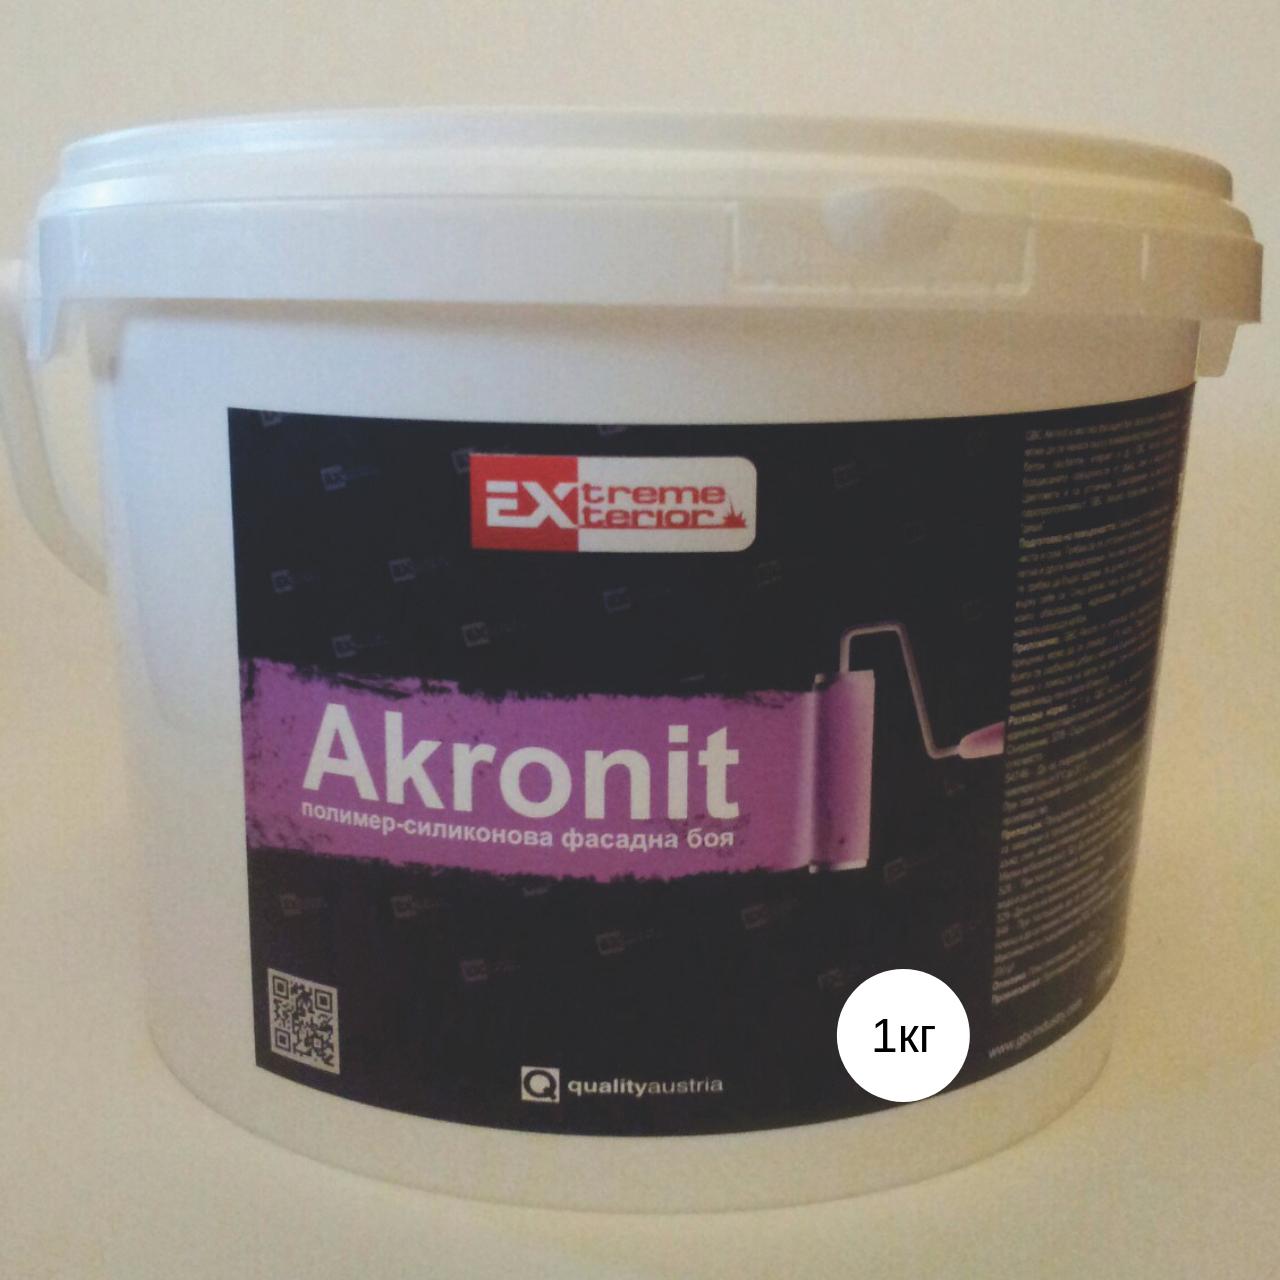 Силиконовая фасадная краска GBC Akronit 1кг